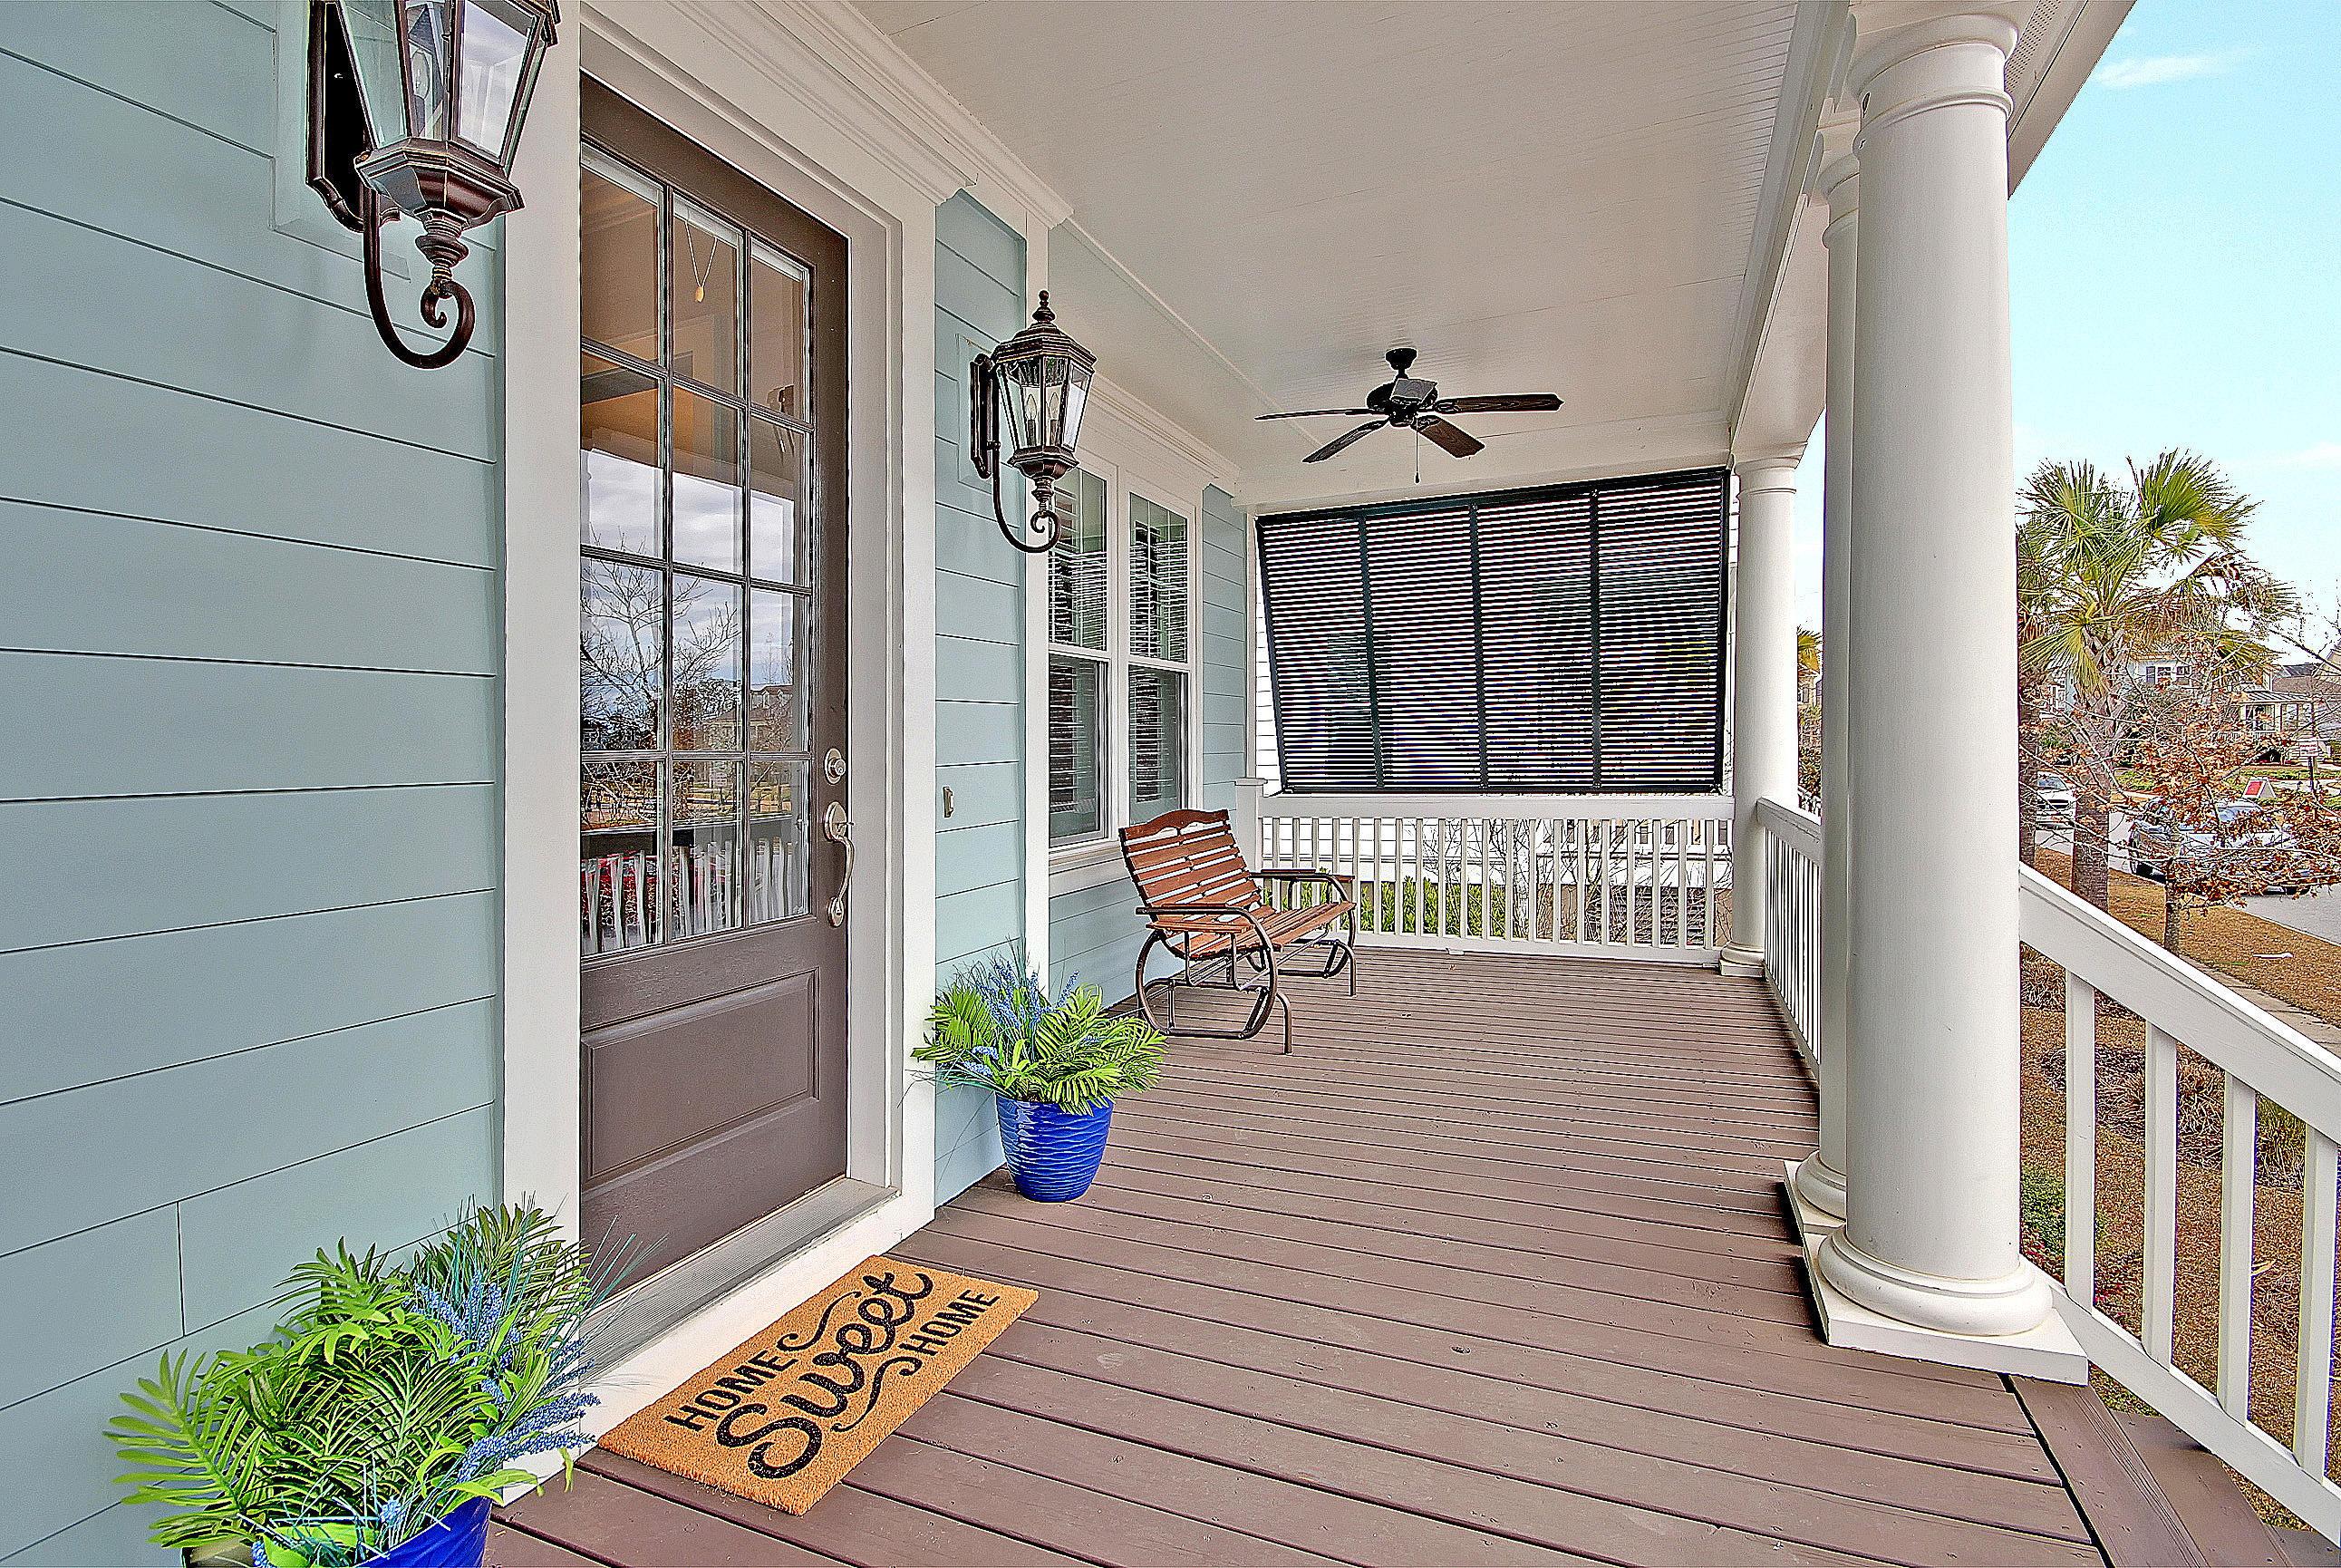 Daniel Island Homes For Sale - 2528 Gatewood, Daniel Island, SC - 24